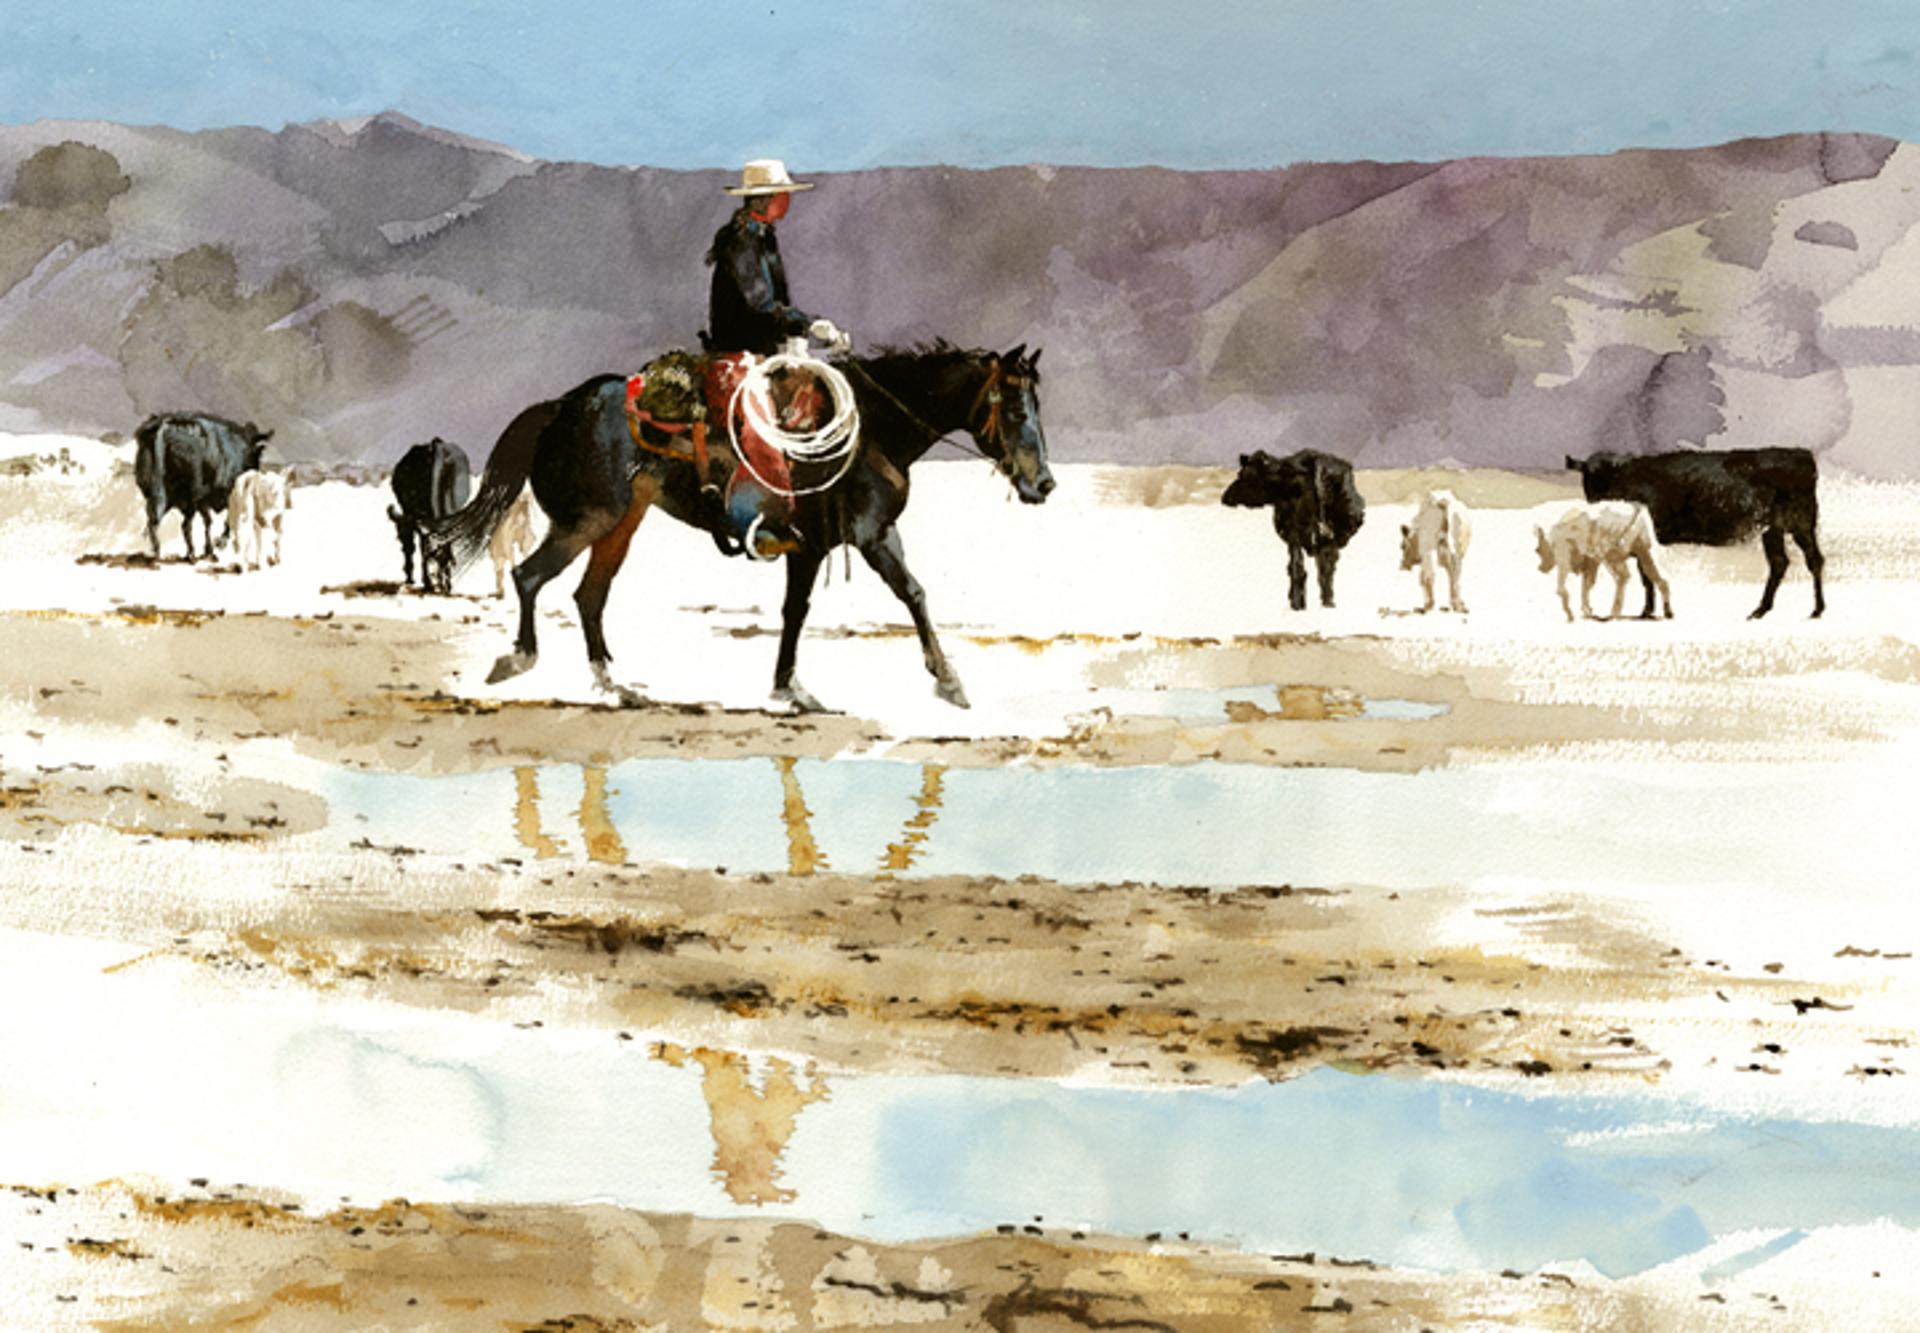 After the West Desert Rain by Don Weller